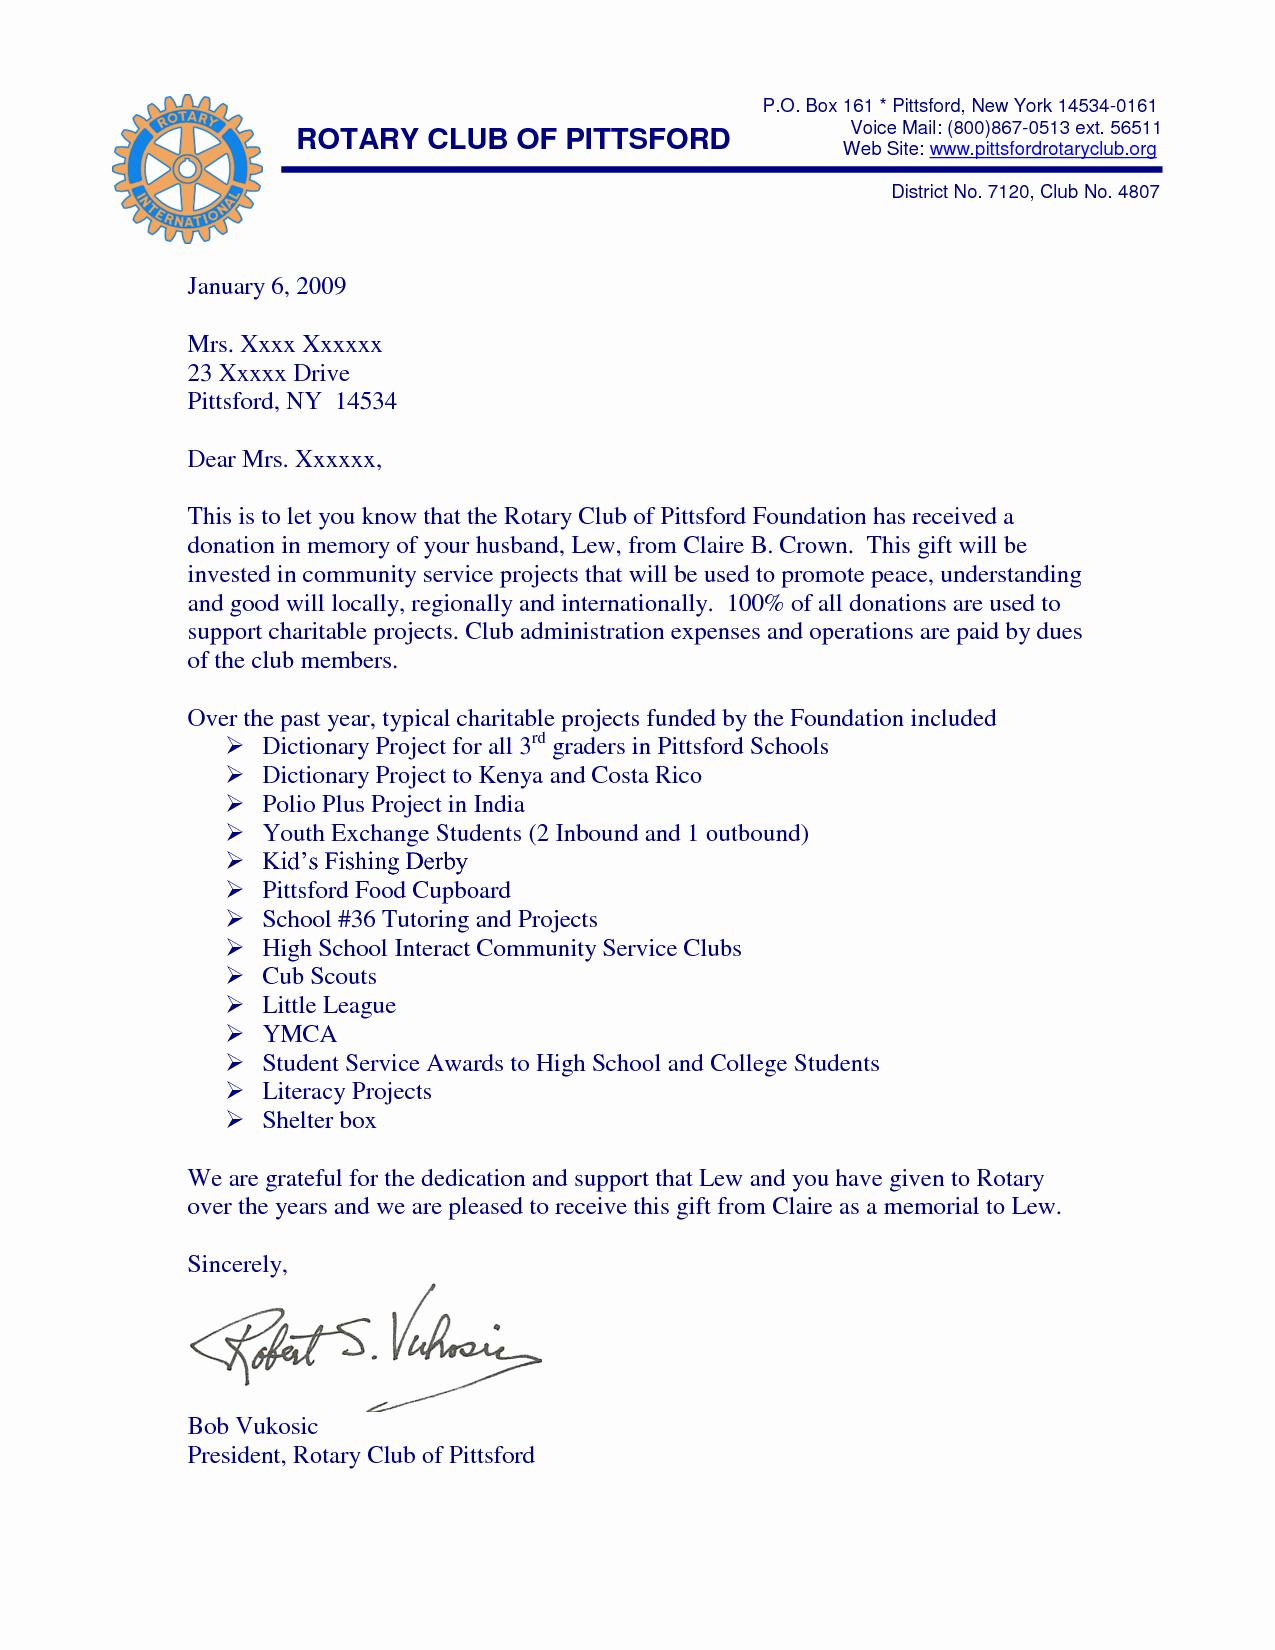 Memorial Donation Letter Template Inspirational Best S Of Gift Donation Letter Template Thank You